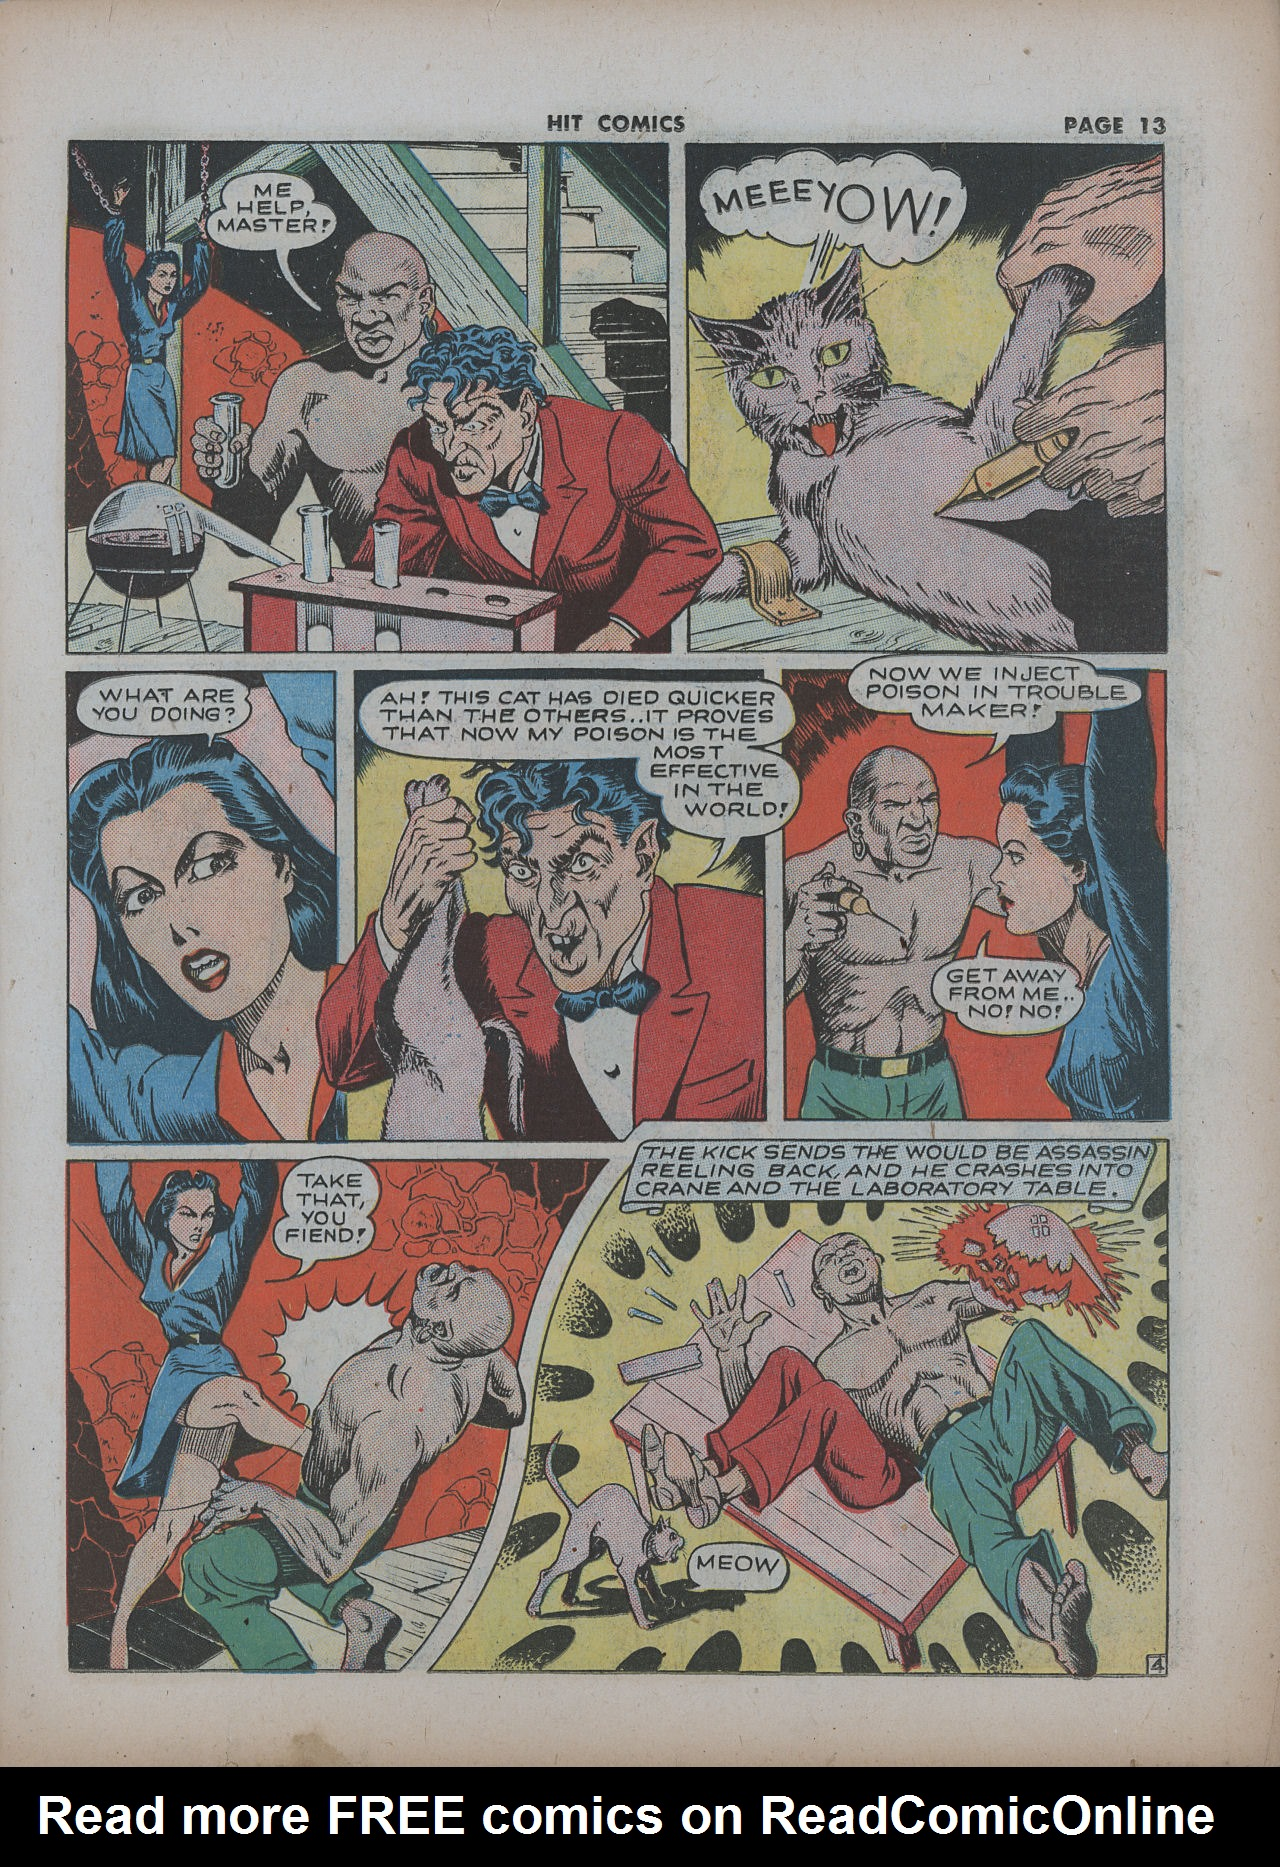 Read online Hit Comics comic -  Issue #22 - 15